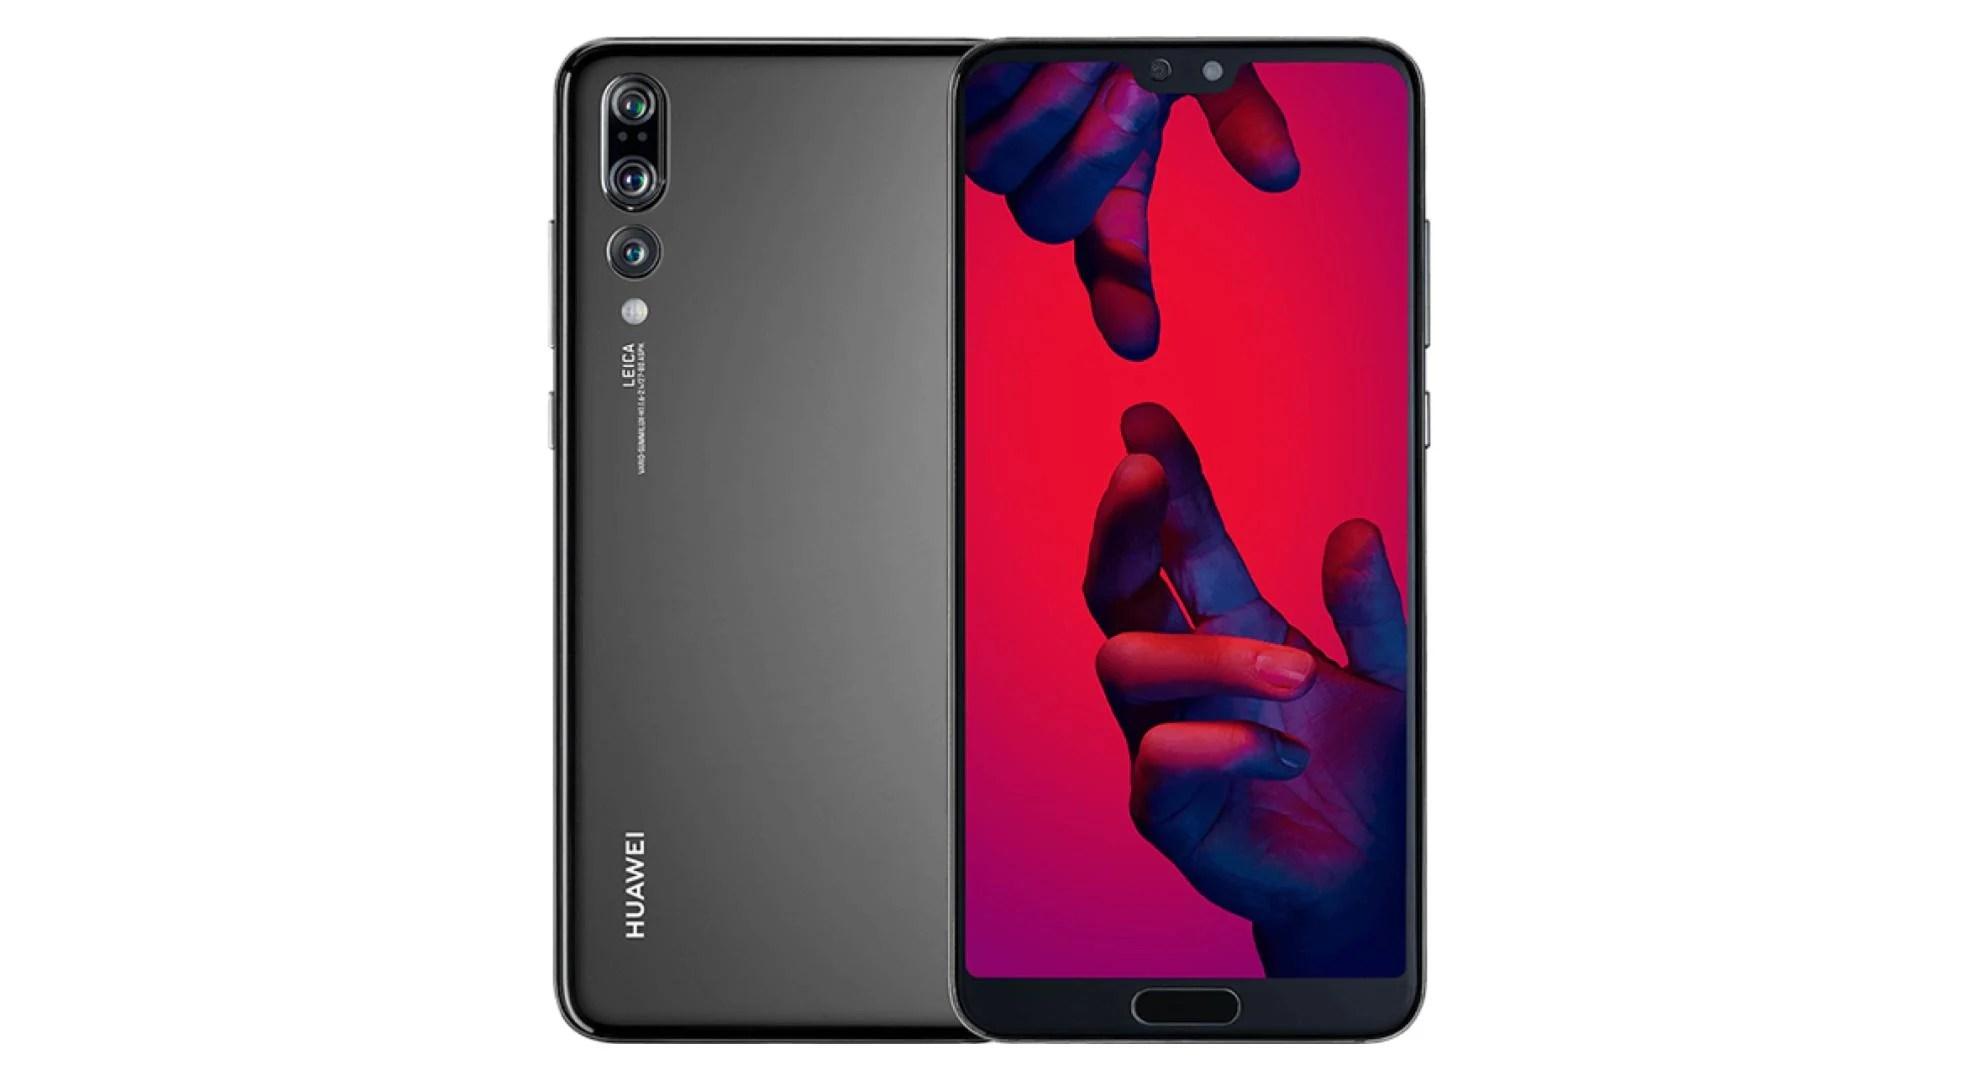 🔥 Bon plan : le Huawei P20 Pro descend à 520 euros sur Rakuten